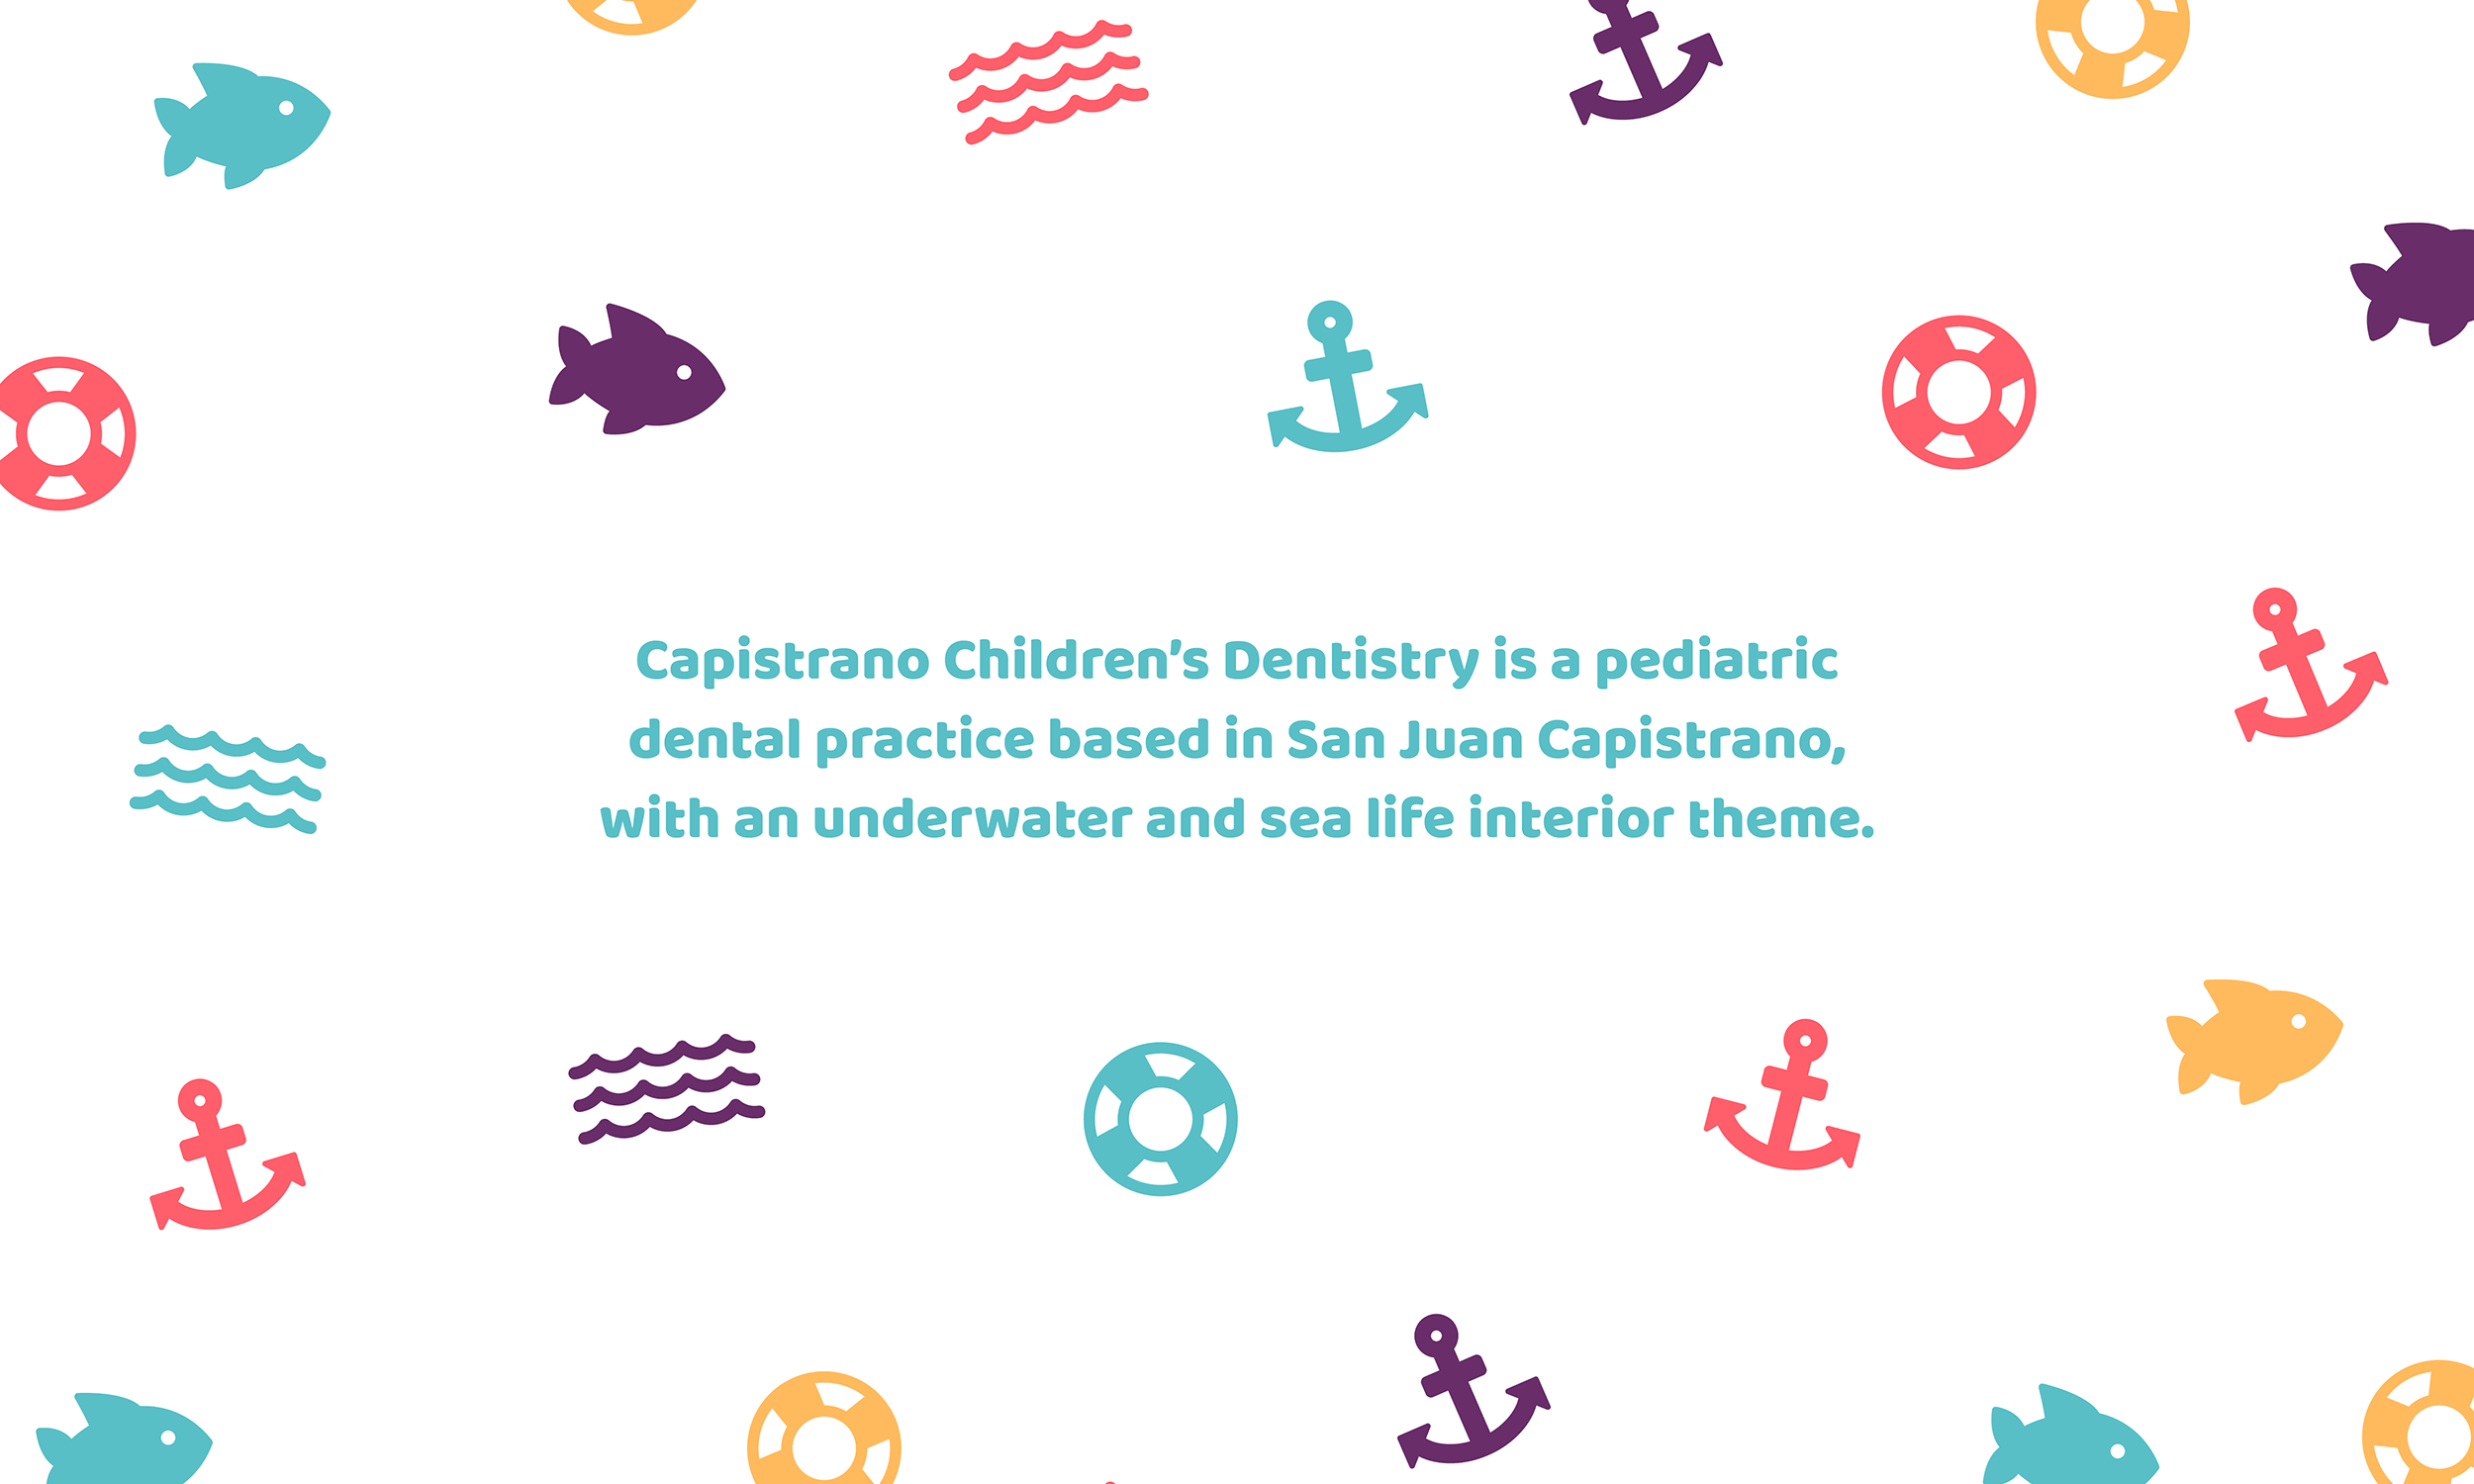 Capistrano-Childrens-Dentistry-Logo-Design-Freelance-Graphic-Designer-Margate-Kent-Presentation-Pediatric-Dental-Graphic-Design